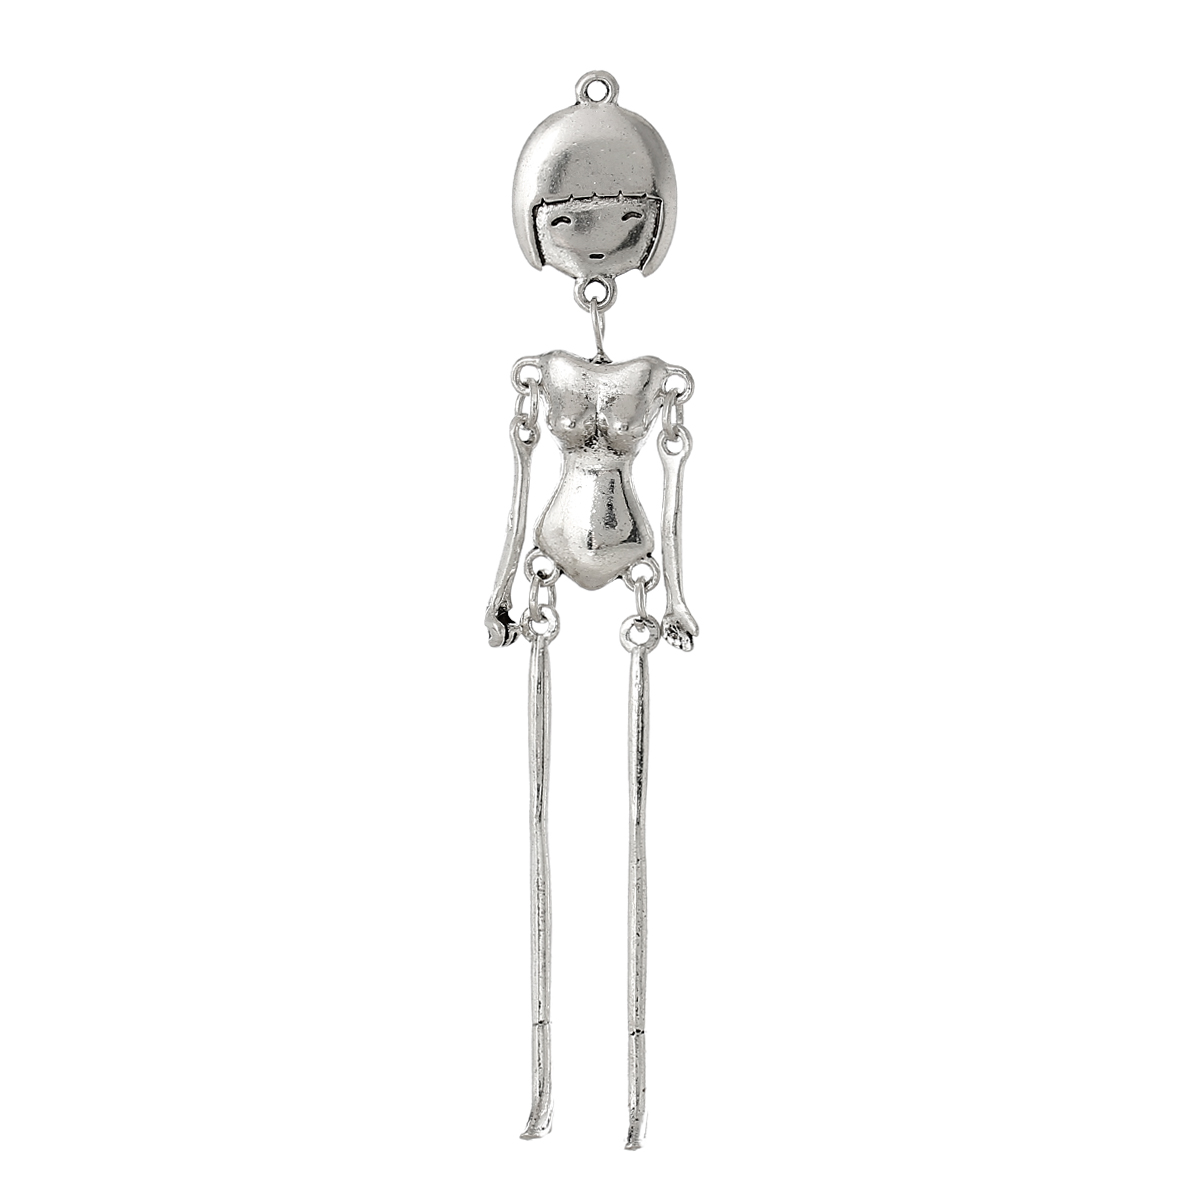 Aliexpress.com : Buy DoreenBeads Body DIY Toy Doll Making